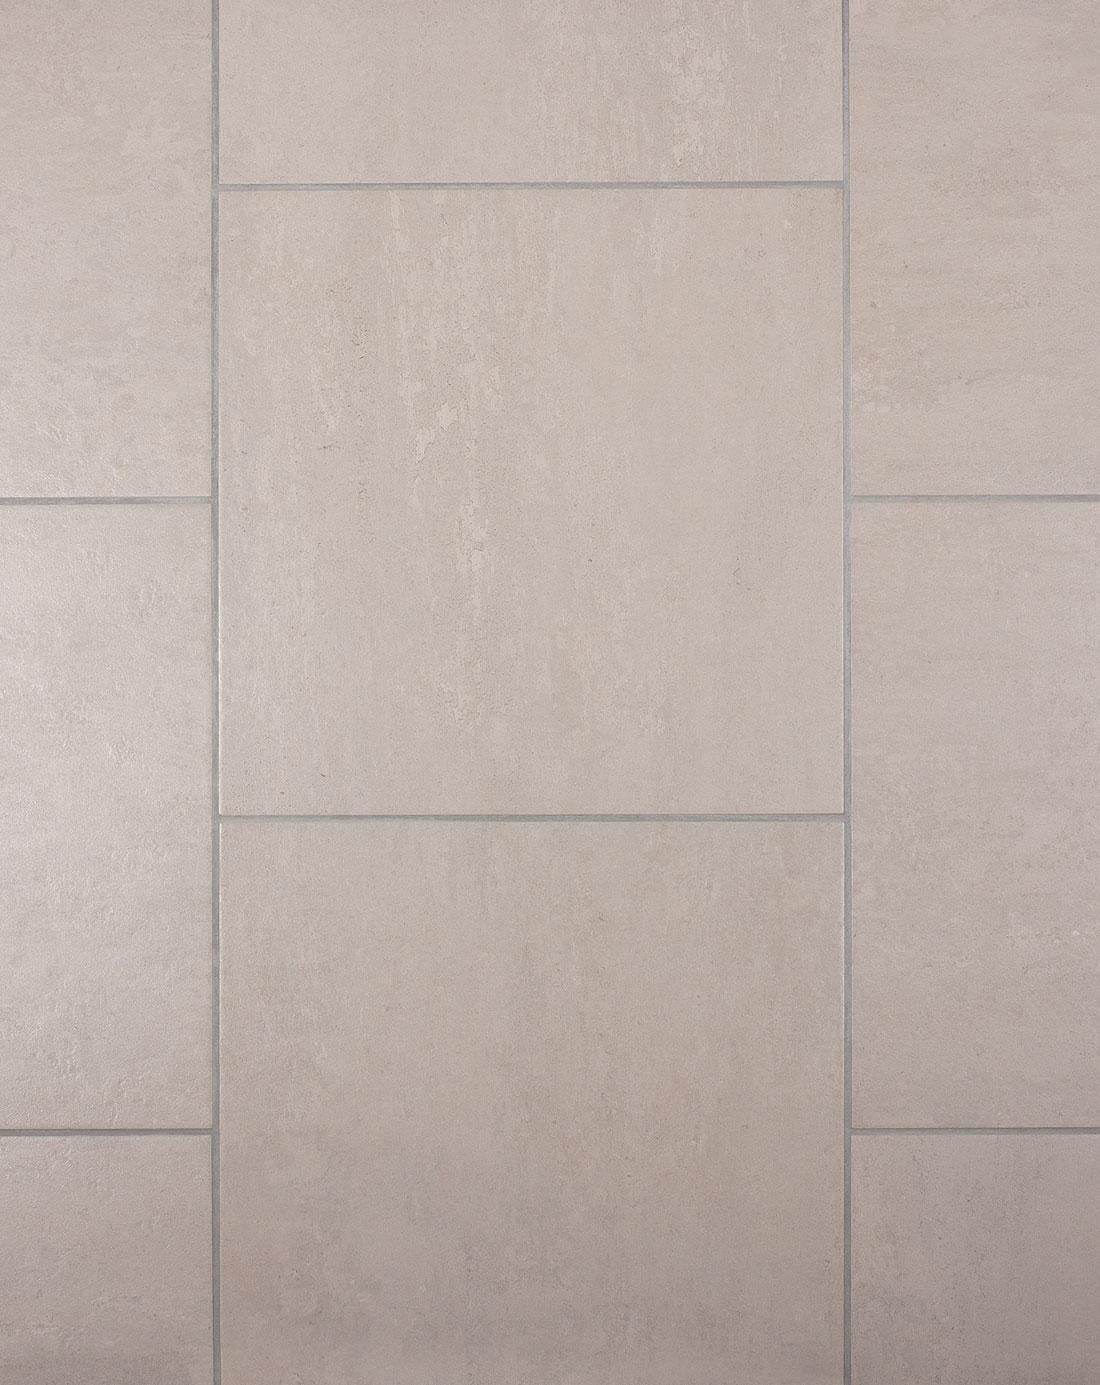 Concept Greige Porcelain Floor Tile Bathroom Tiles Direct